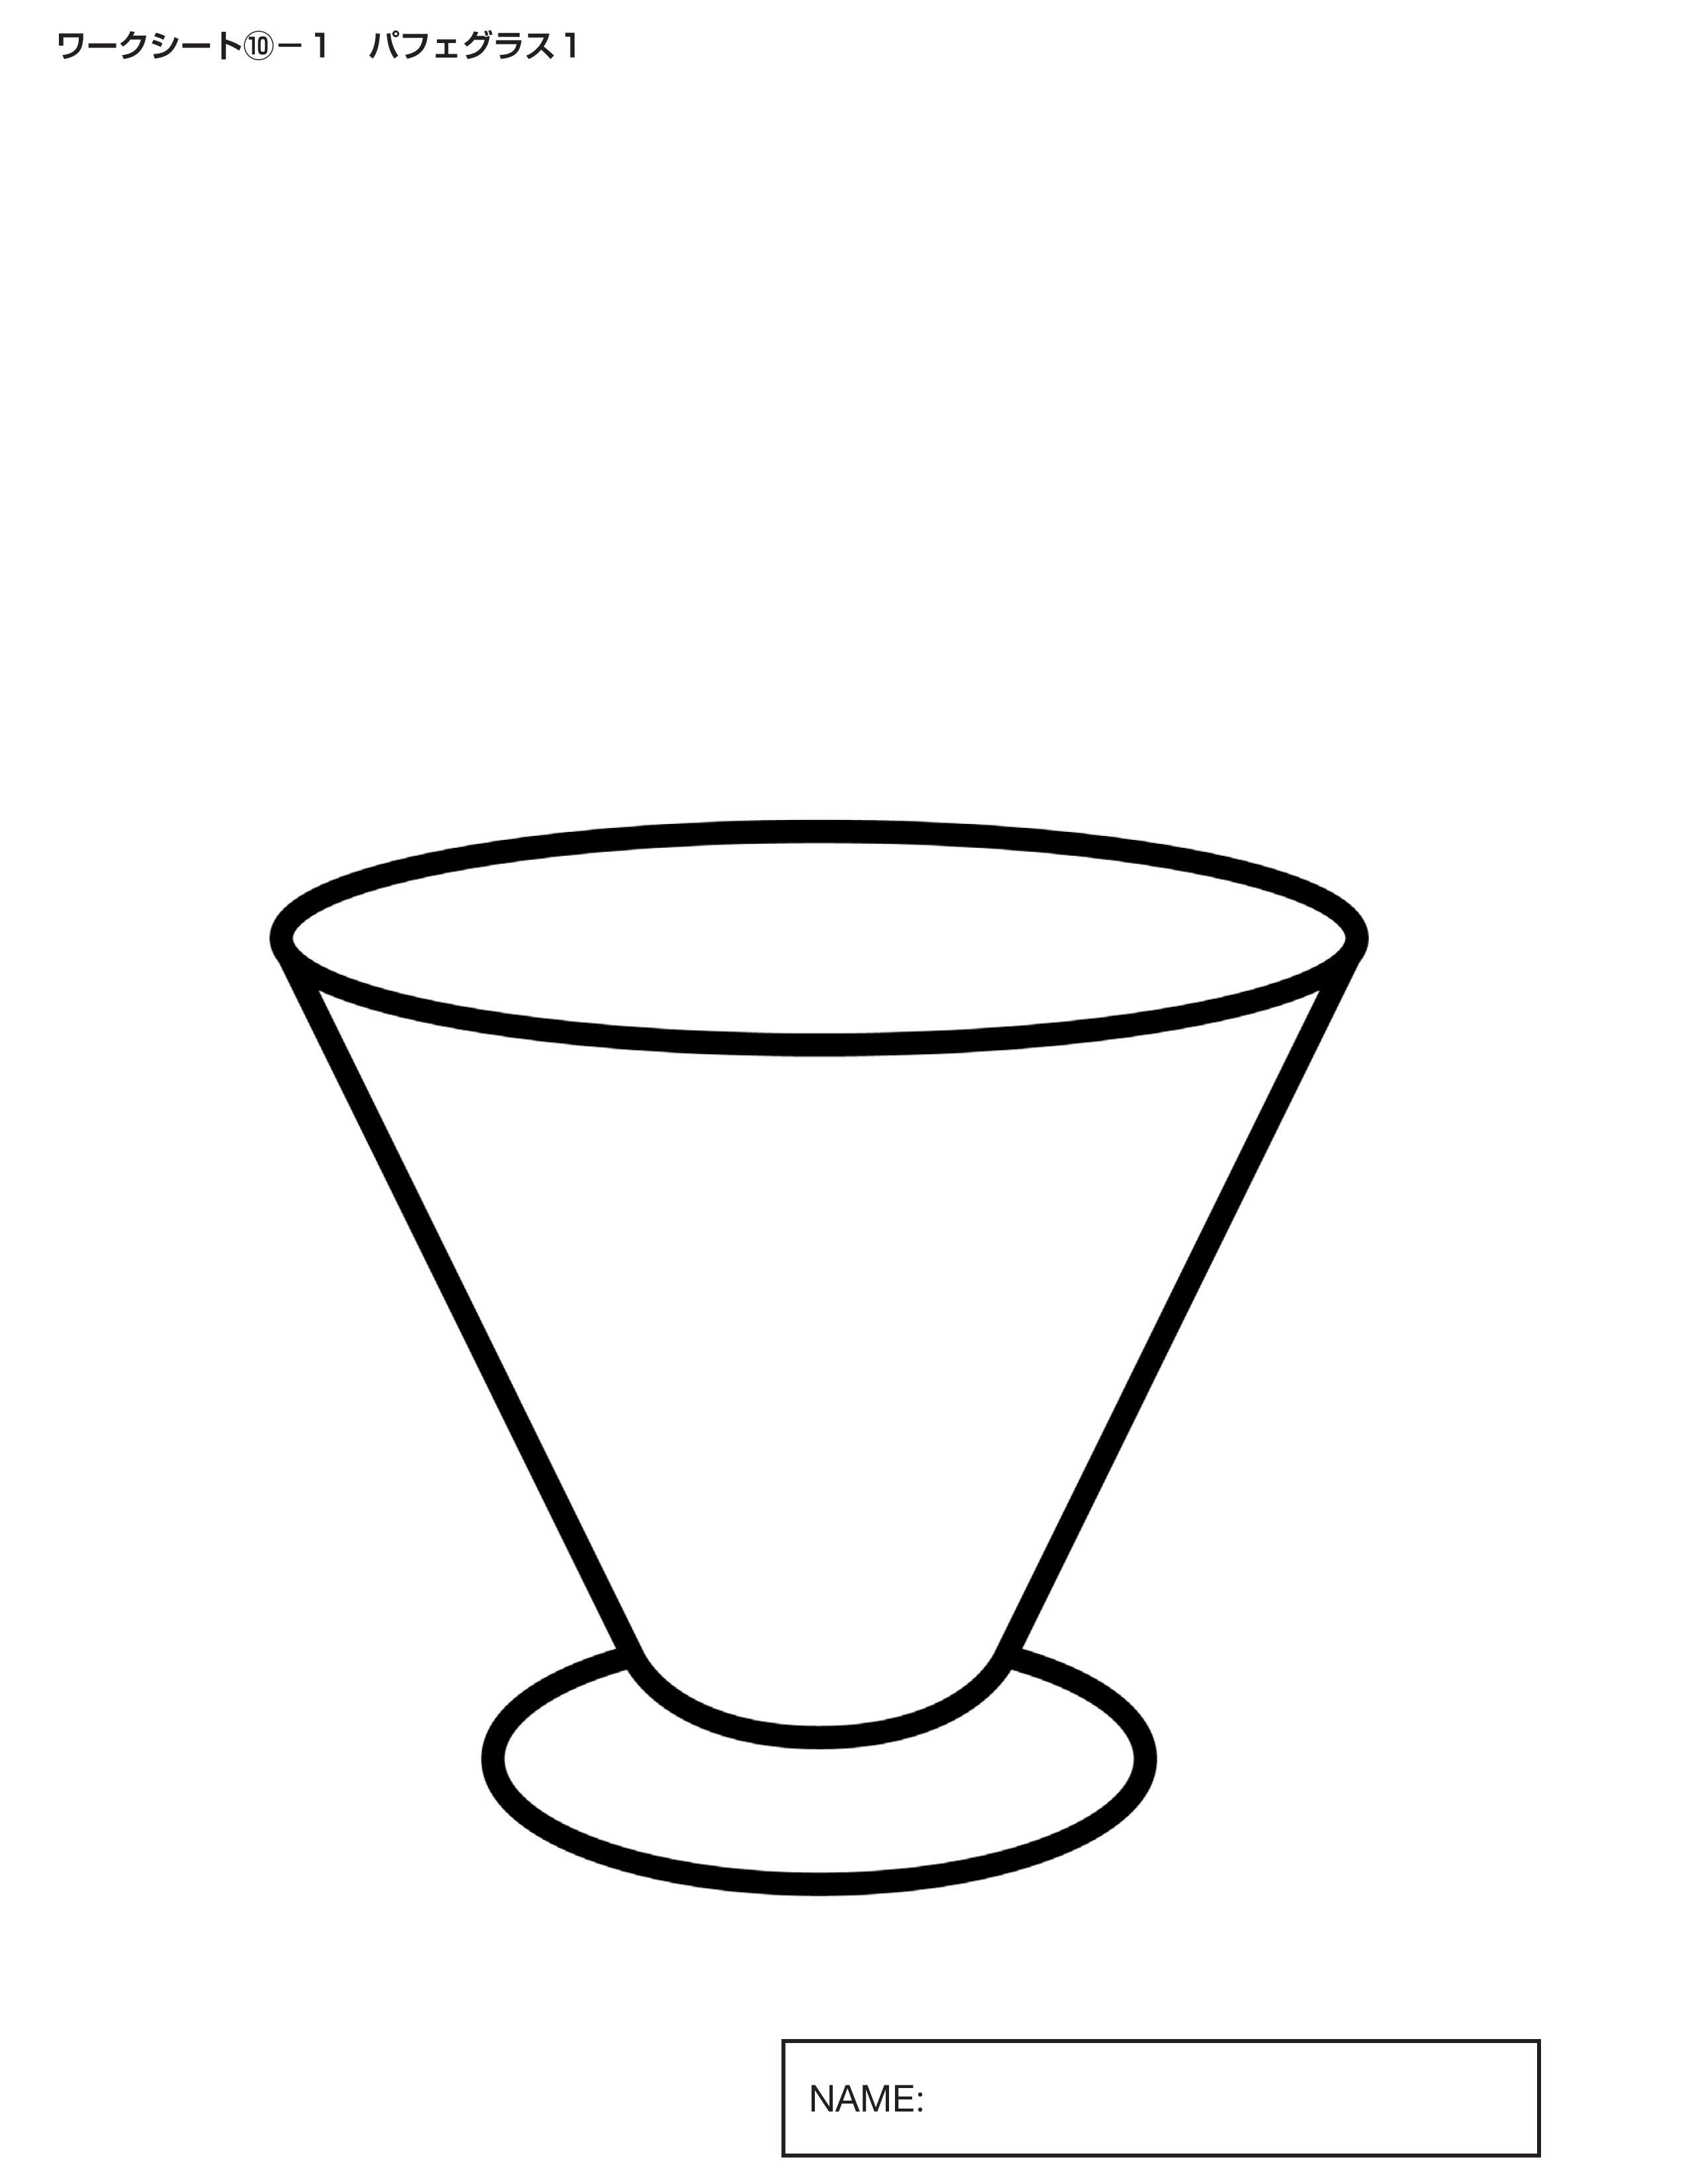 Hifriends1 Worksheet 10 Glass1